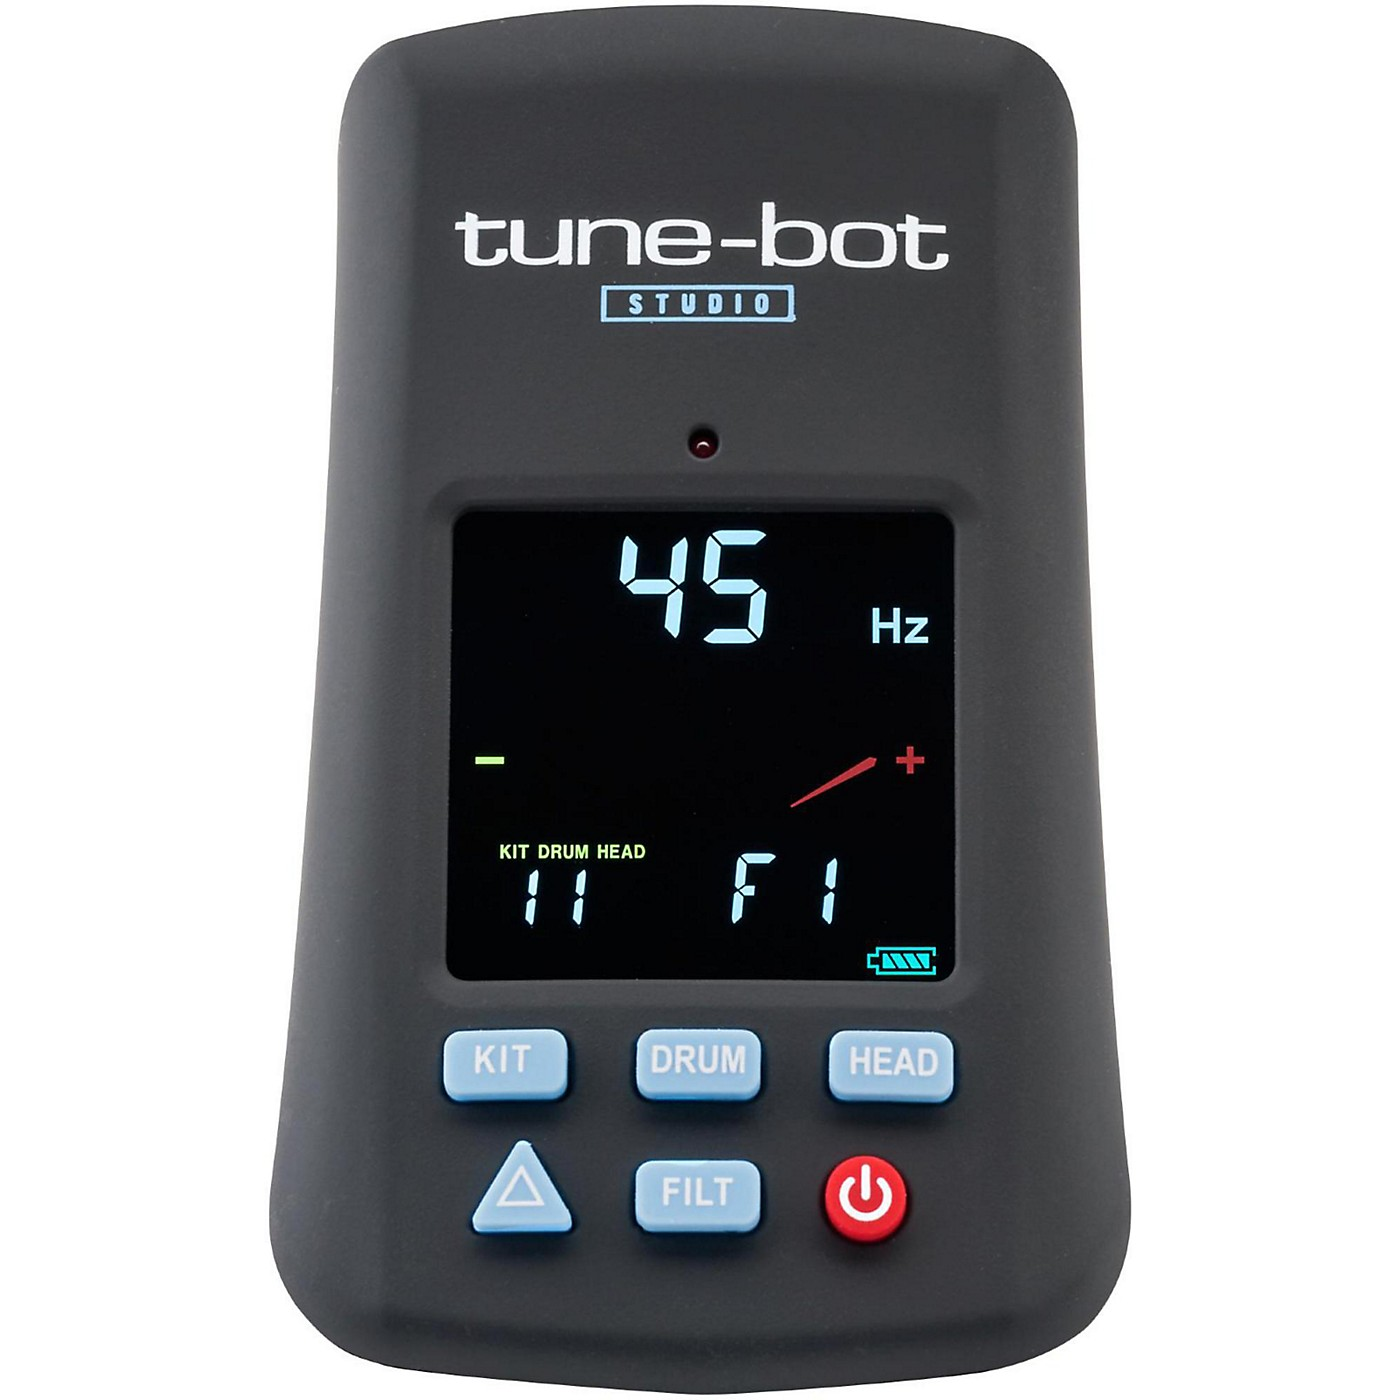 Tune-bot Studio thumbnail